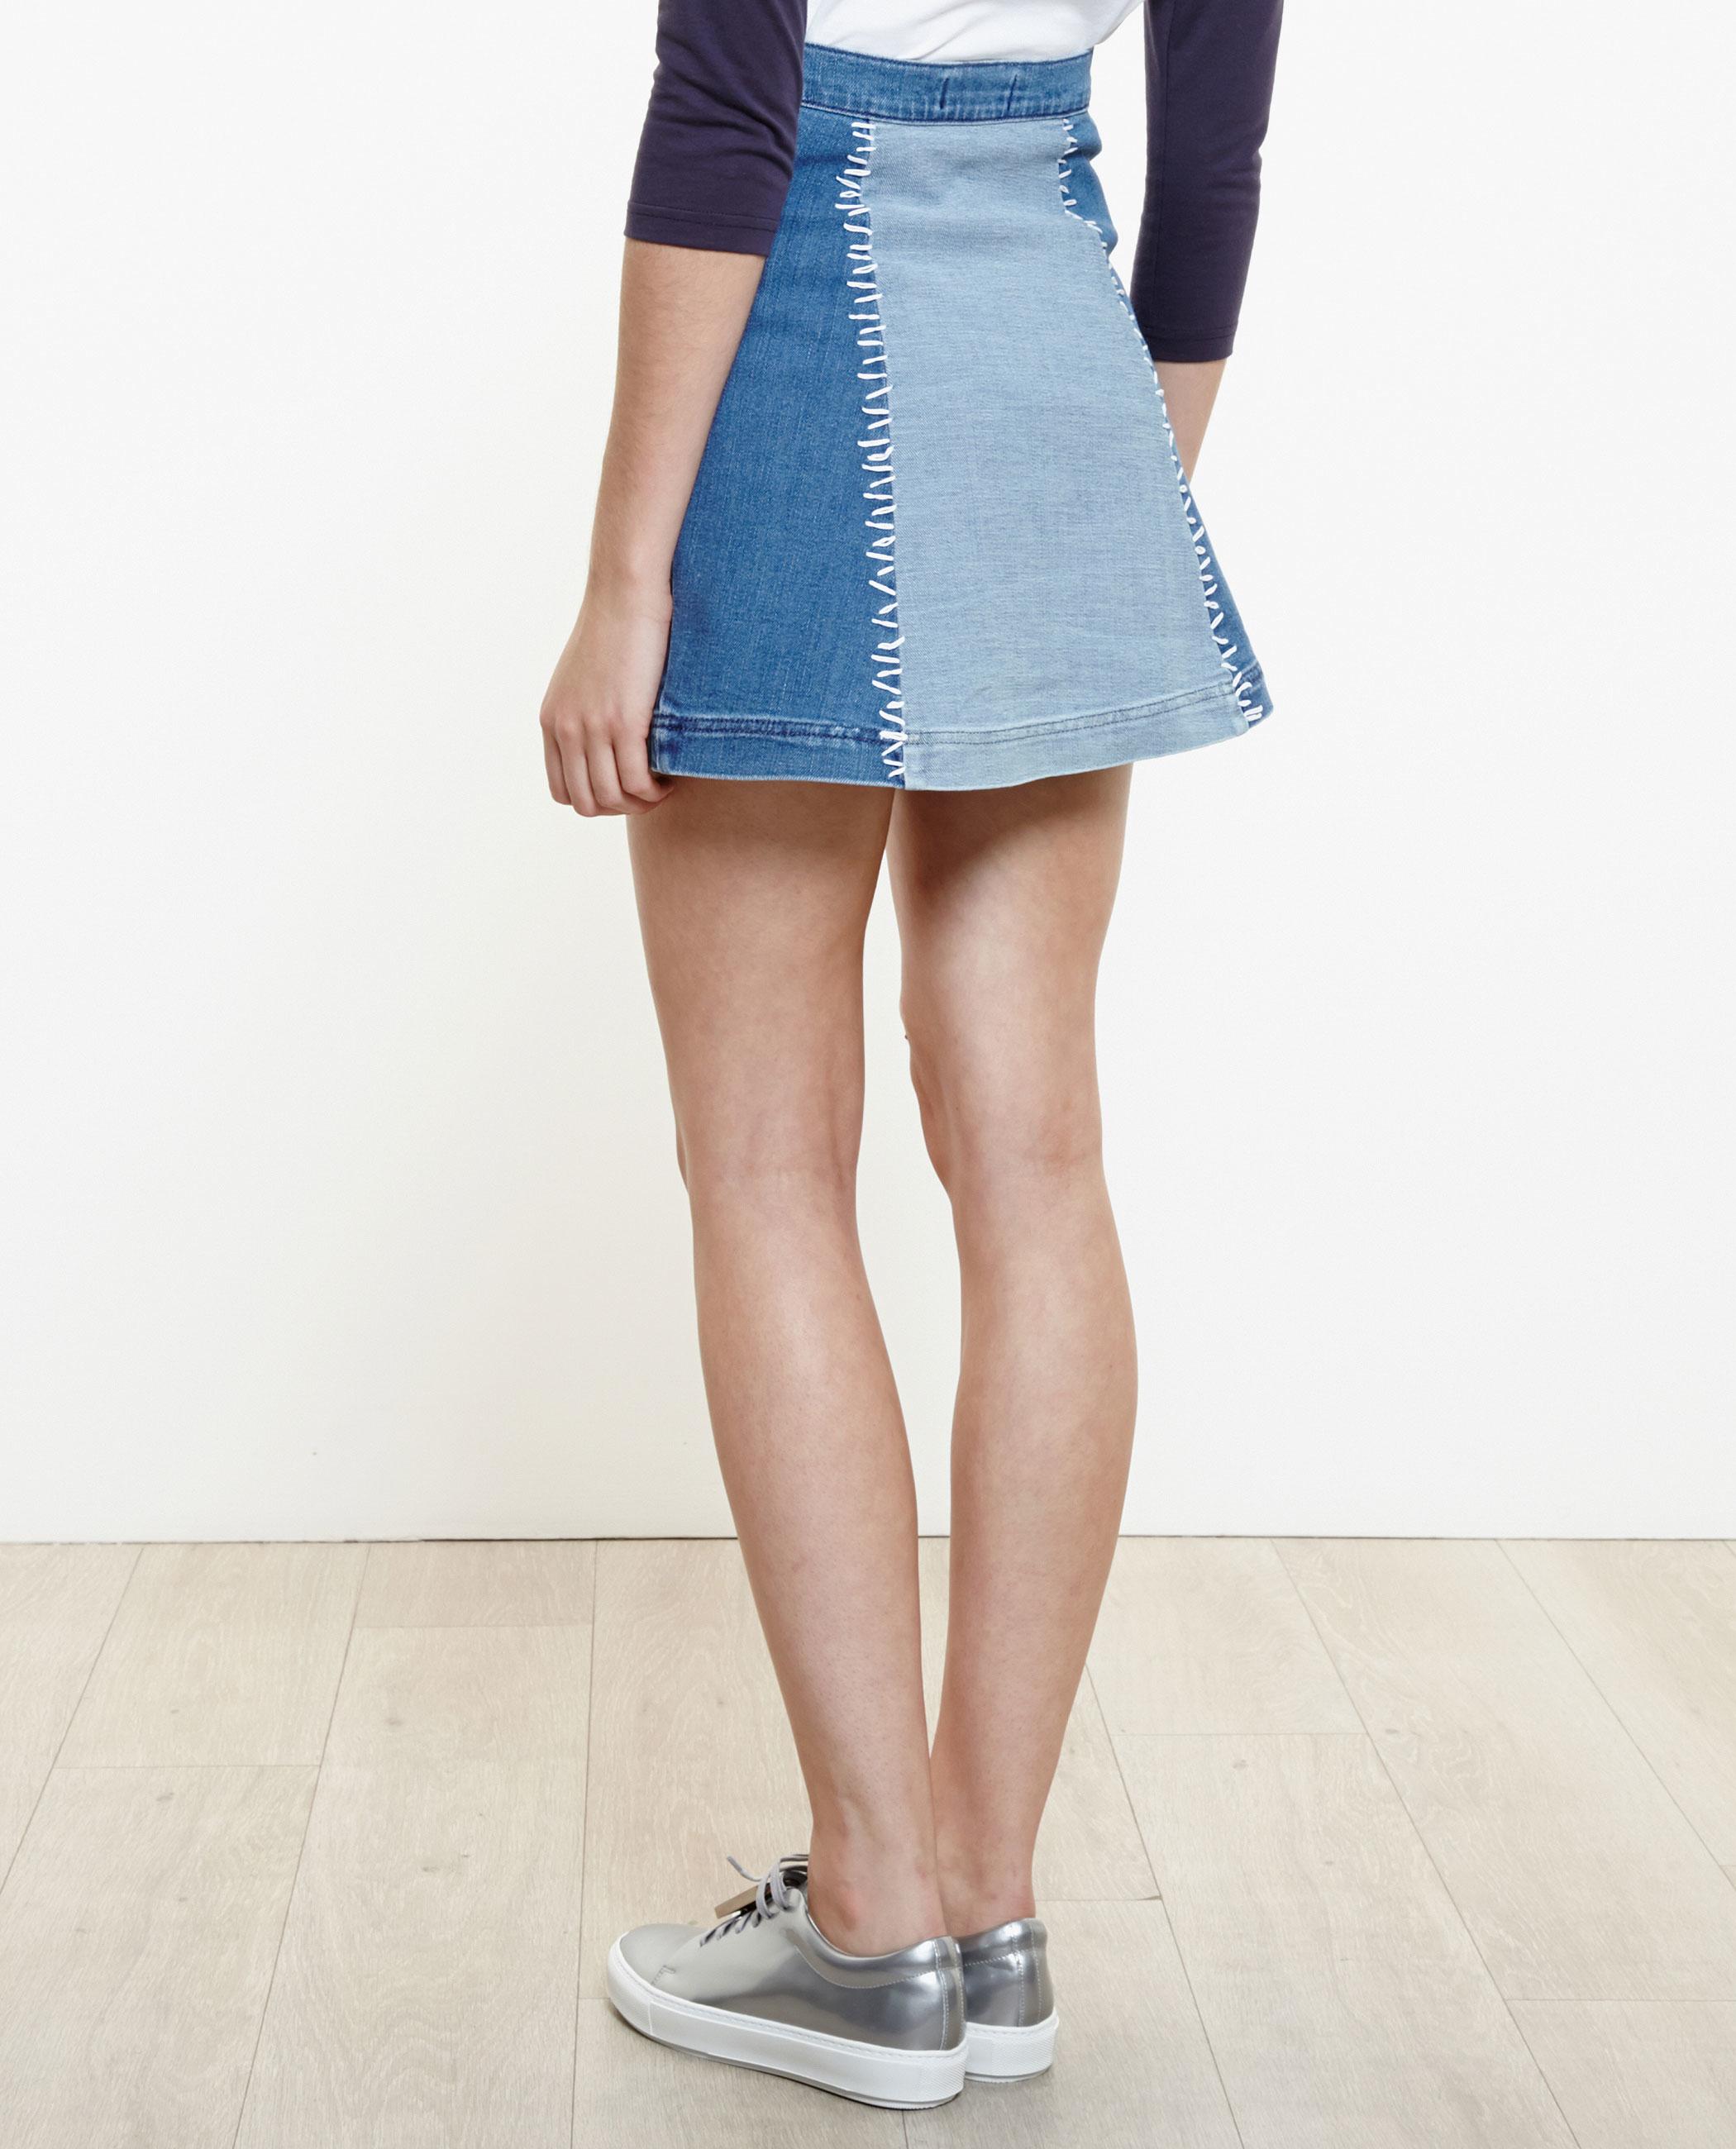 Blue Jean Mini Skirt 4